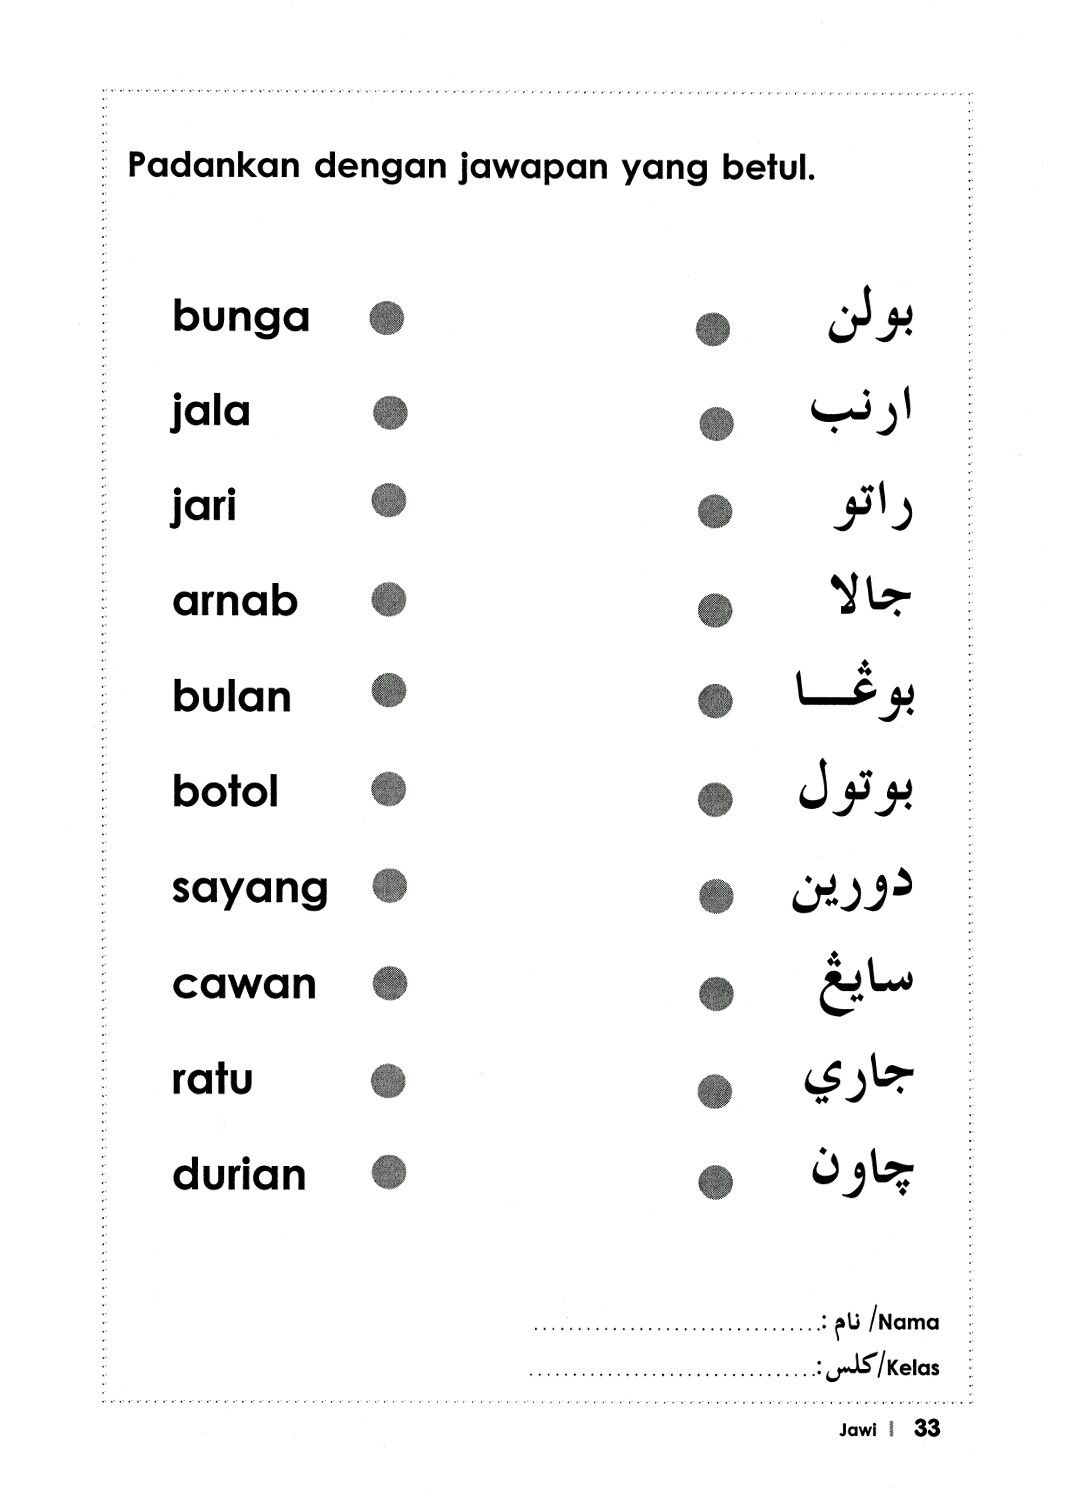 Image Result For Latihan Bahasa Jawi Tahun 2 Word Doc Activities For 6 Year Olds Kindergarten Worksheets